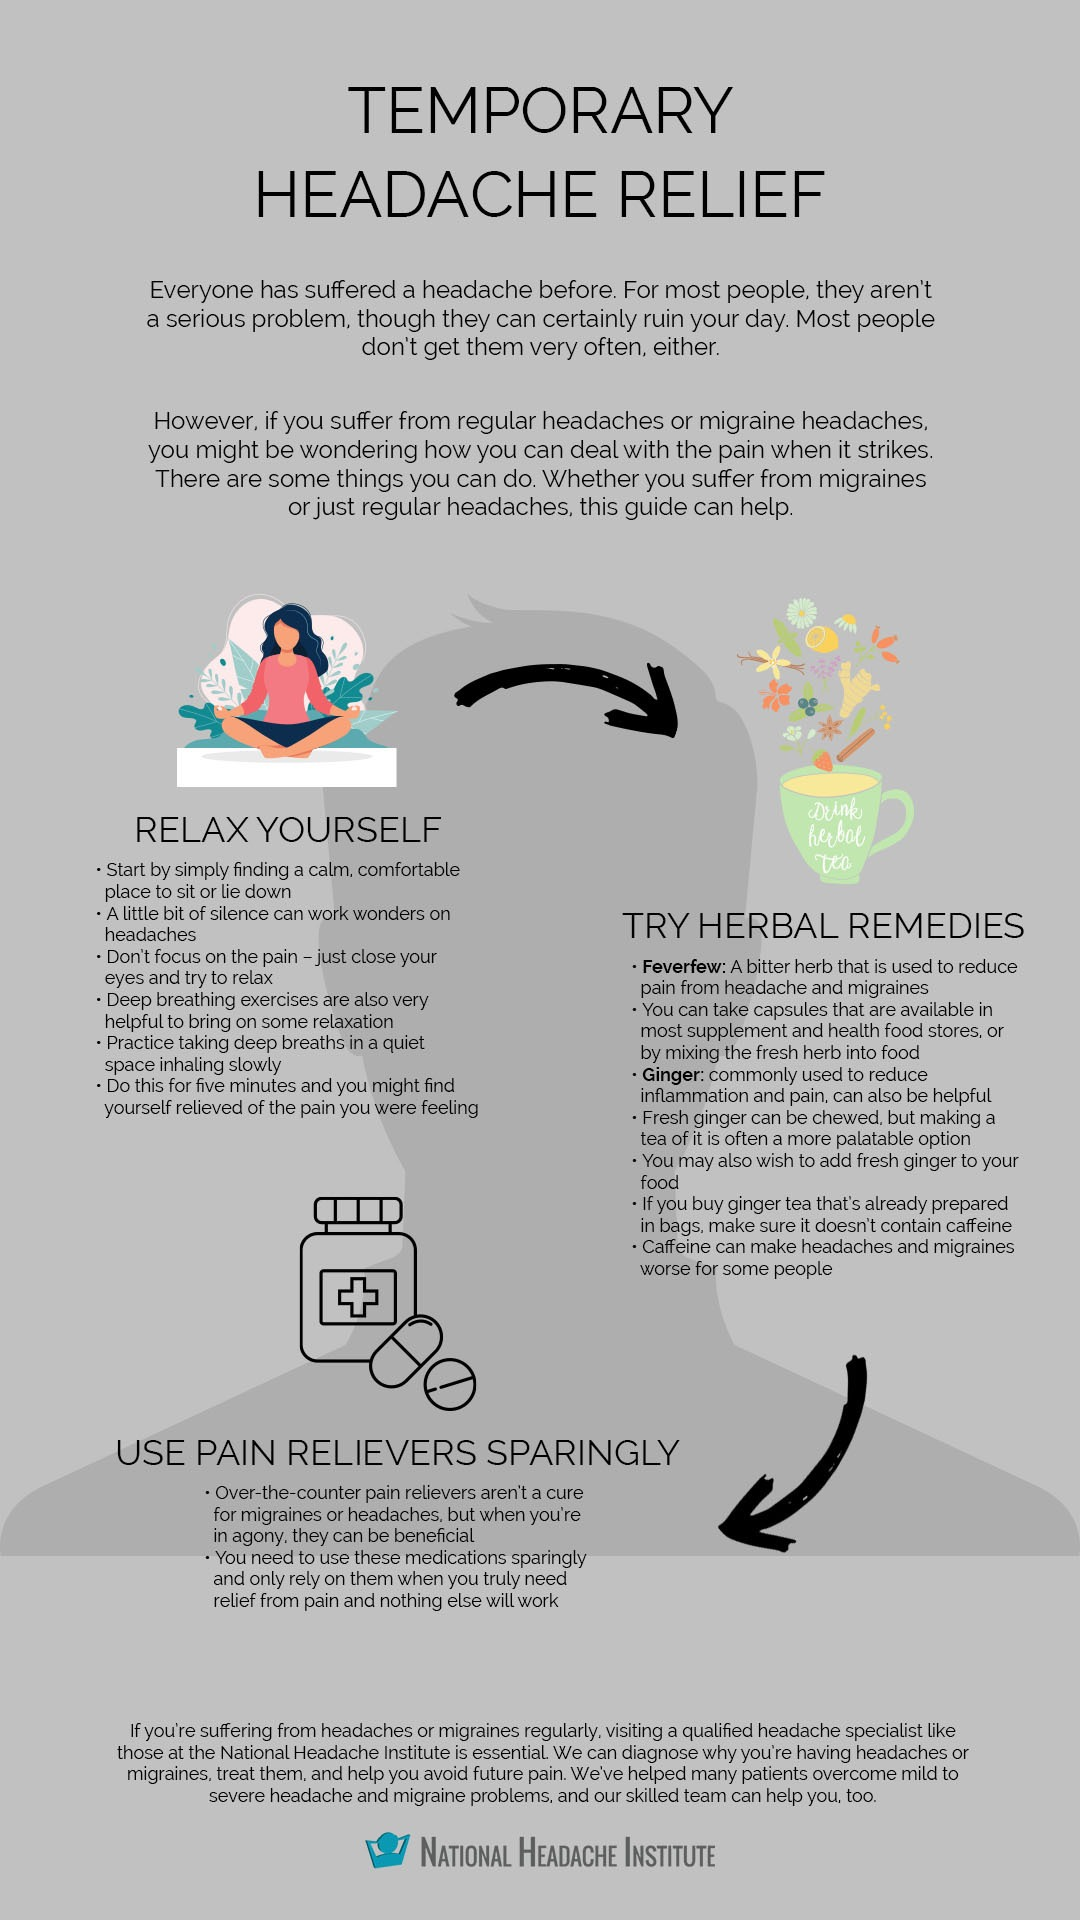 Temporary Headache Relief